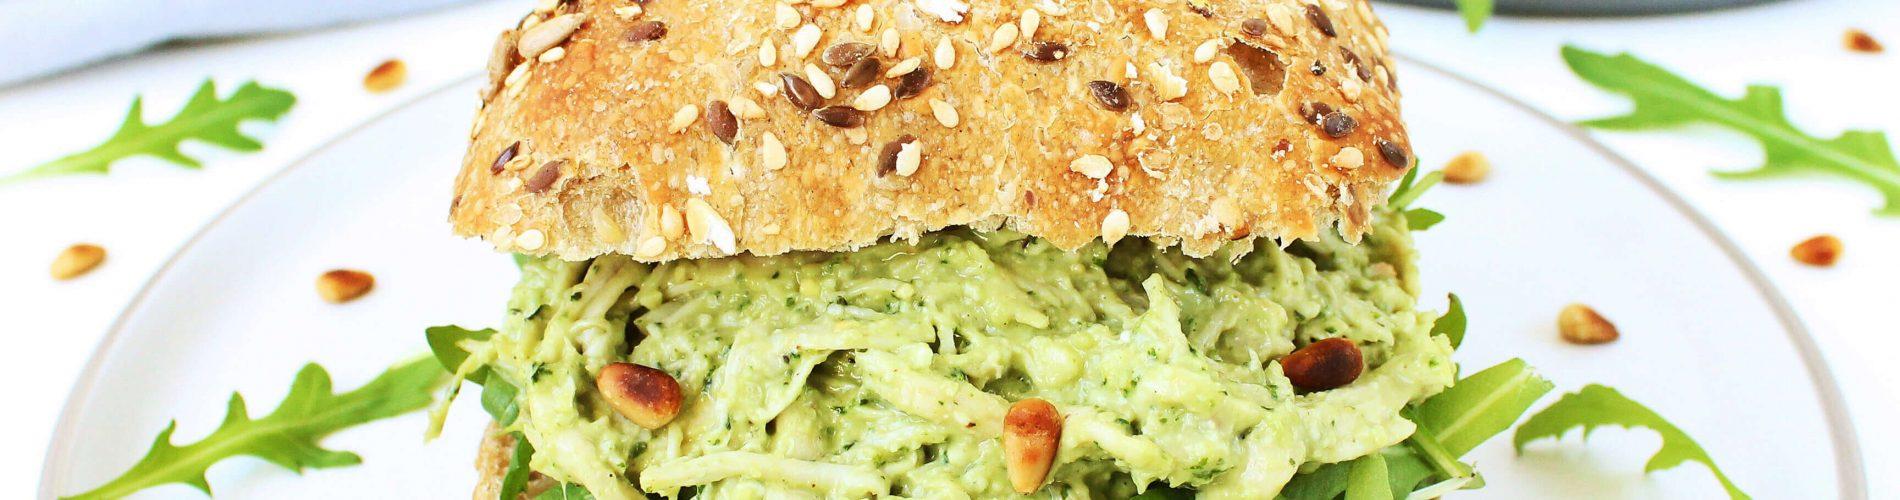 Broodjes met kip pesto salade